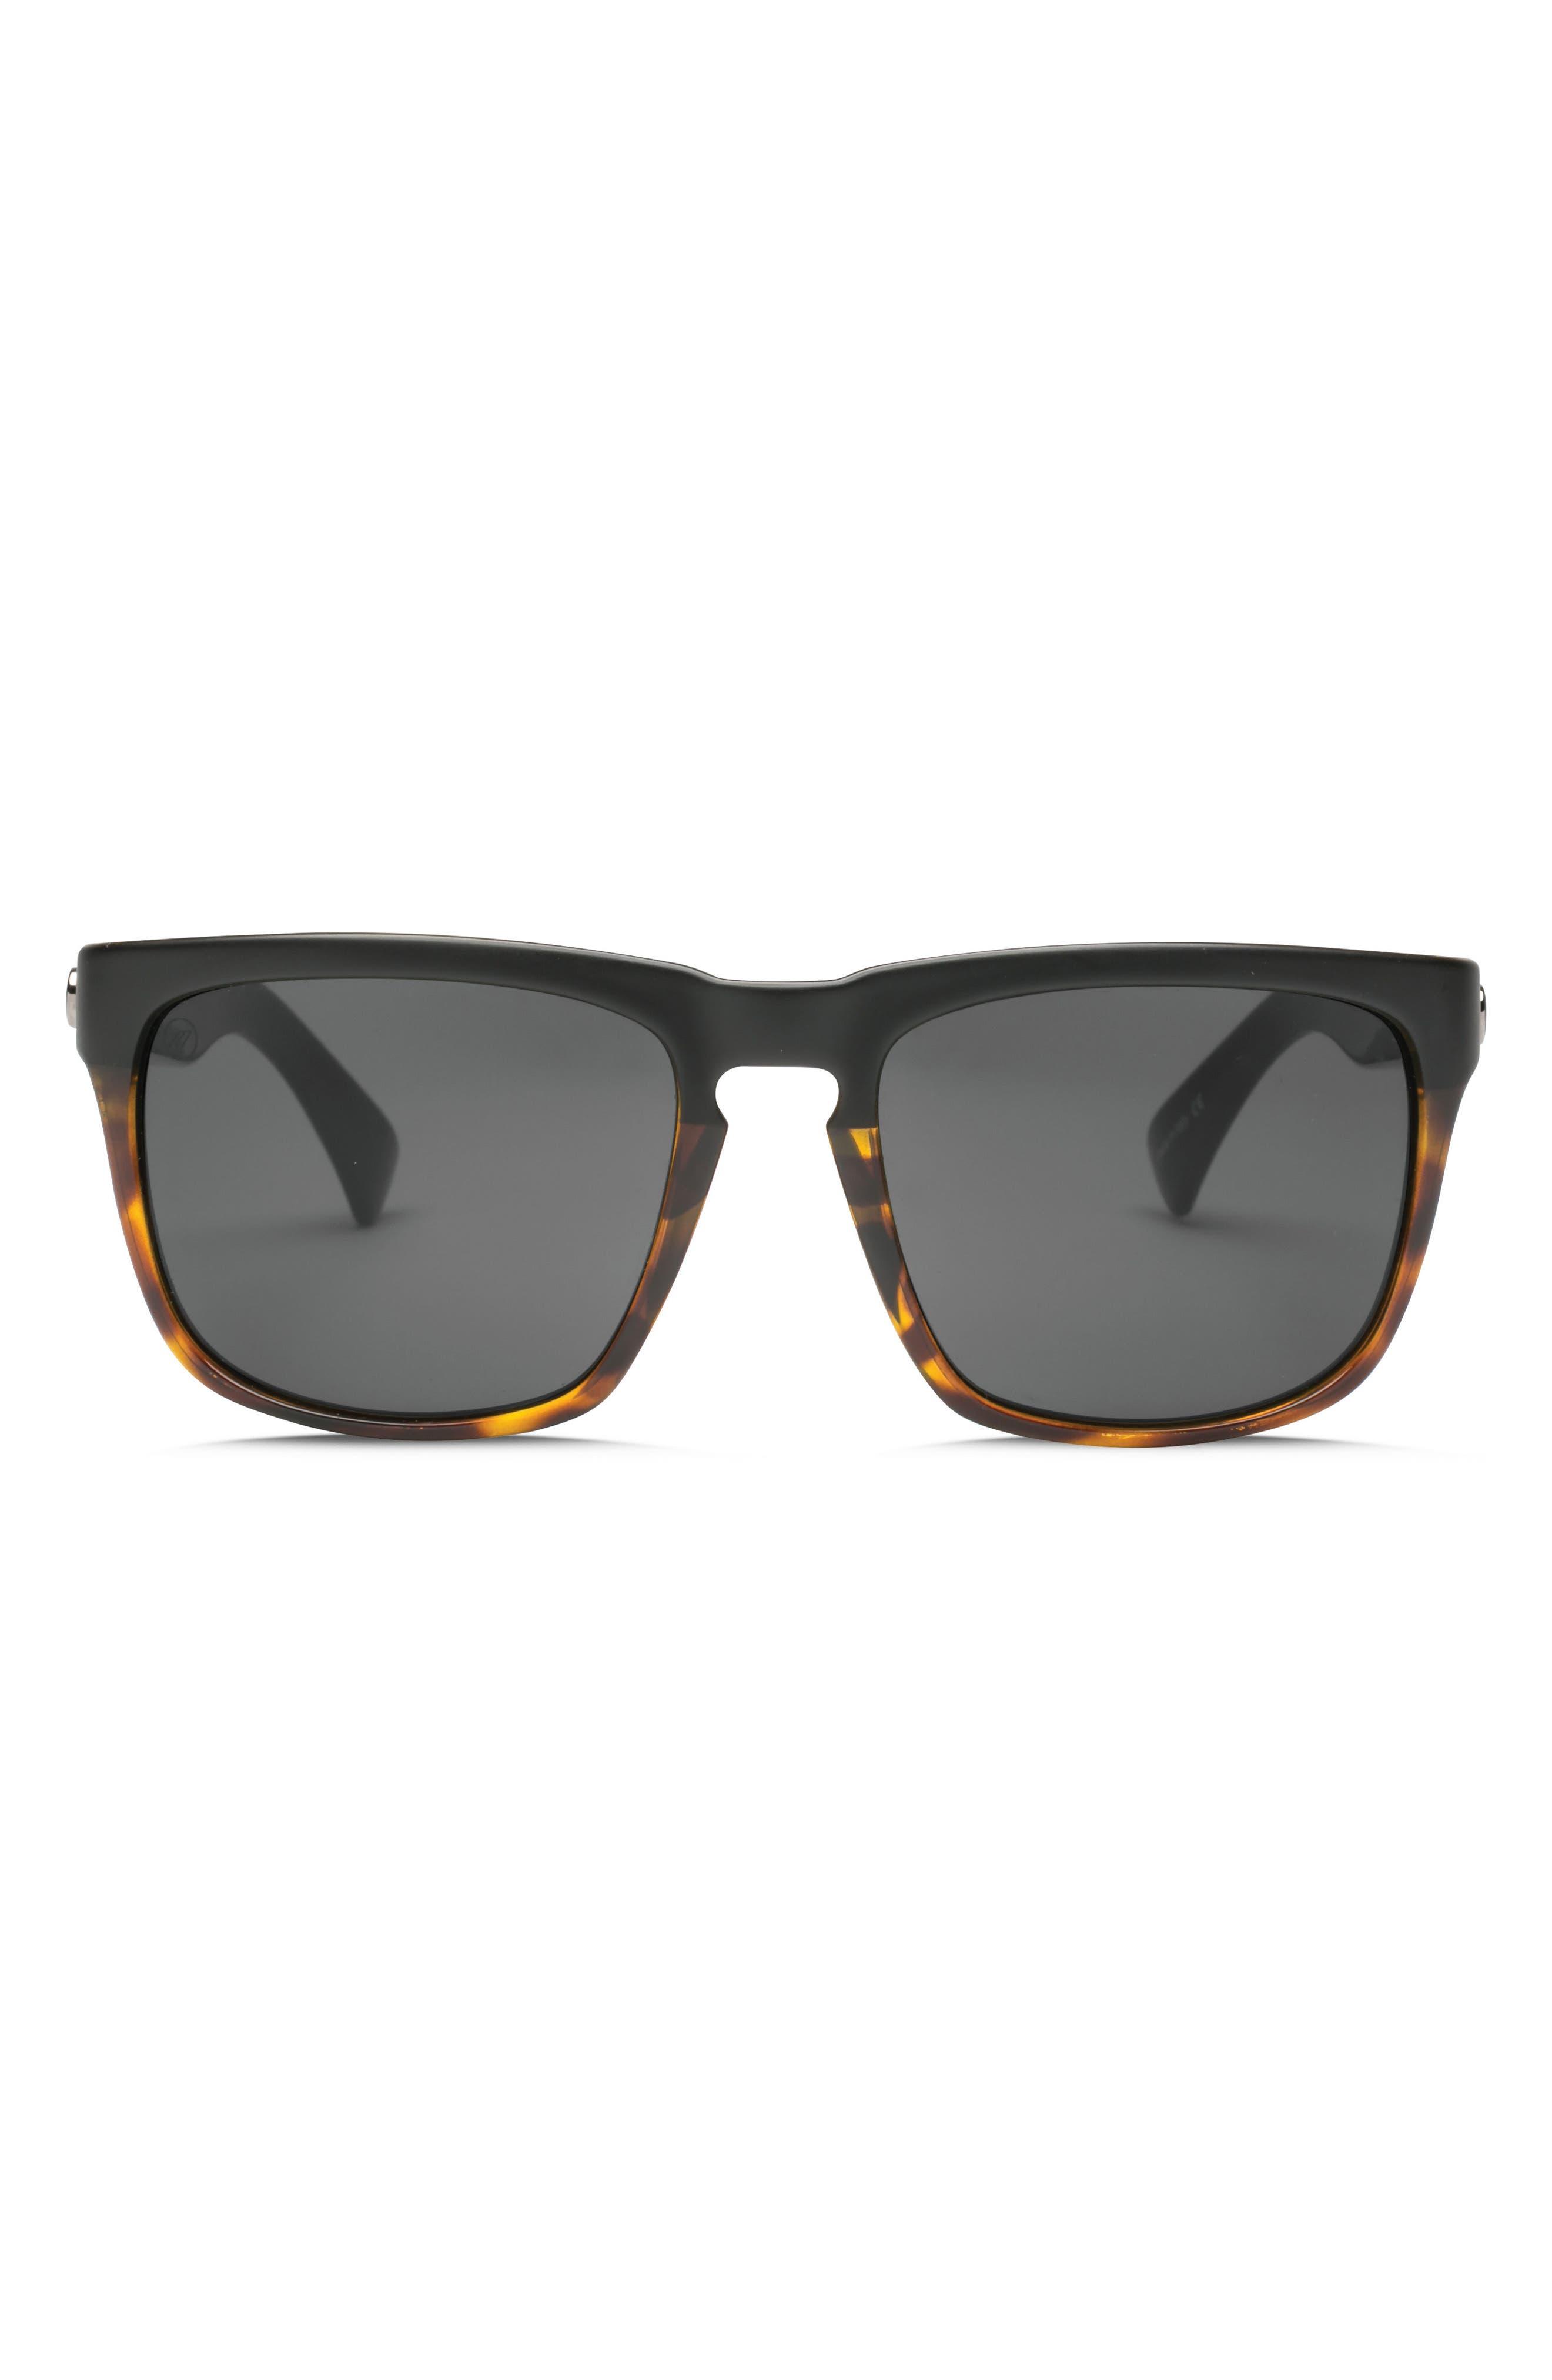 Knoxville XL 61mm Sunglasses,                             Main thumbnail 1, color,                             200